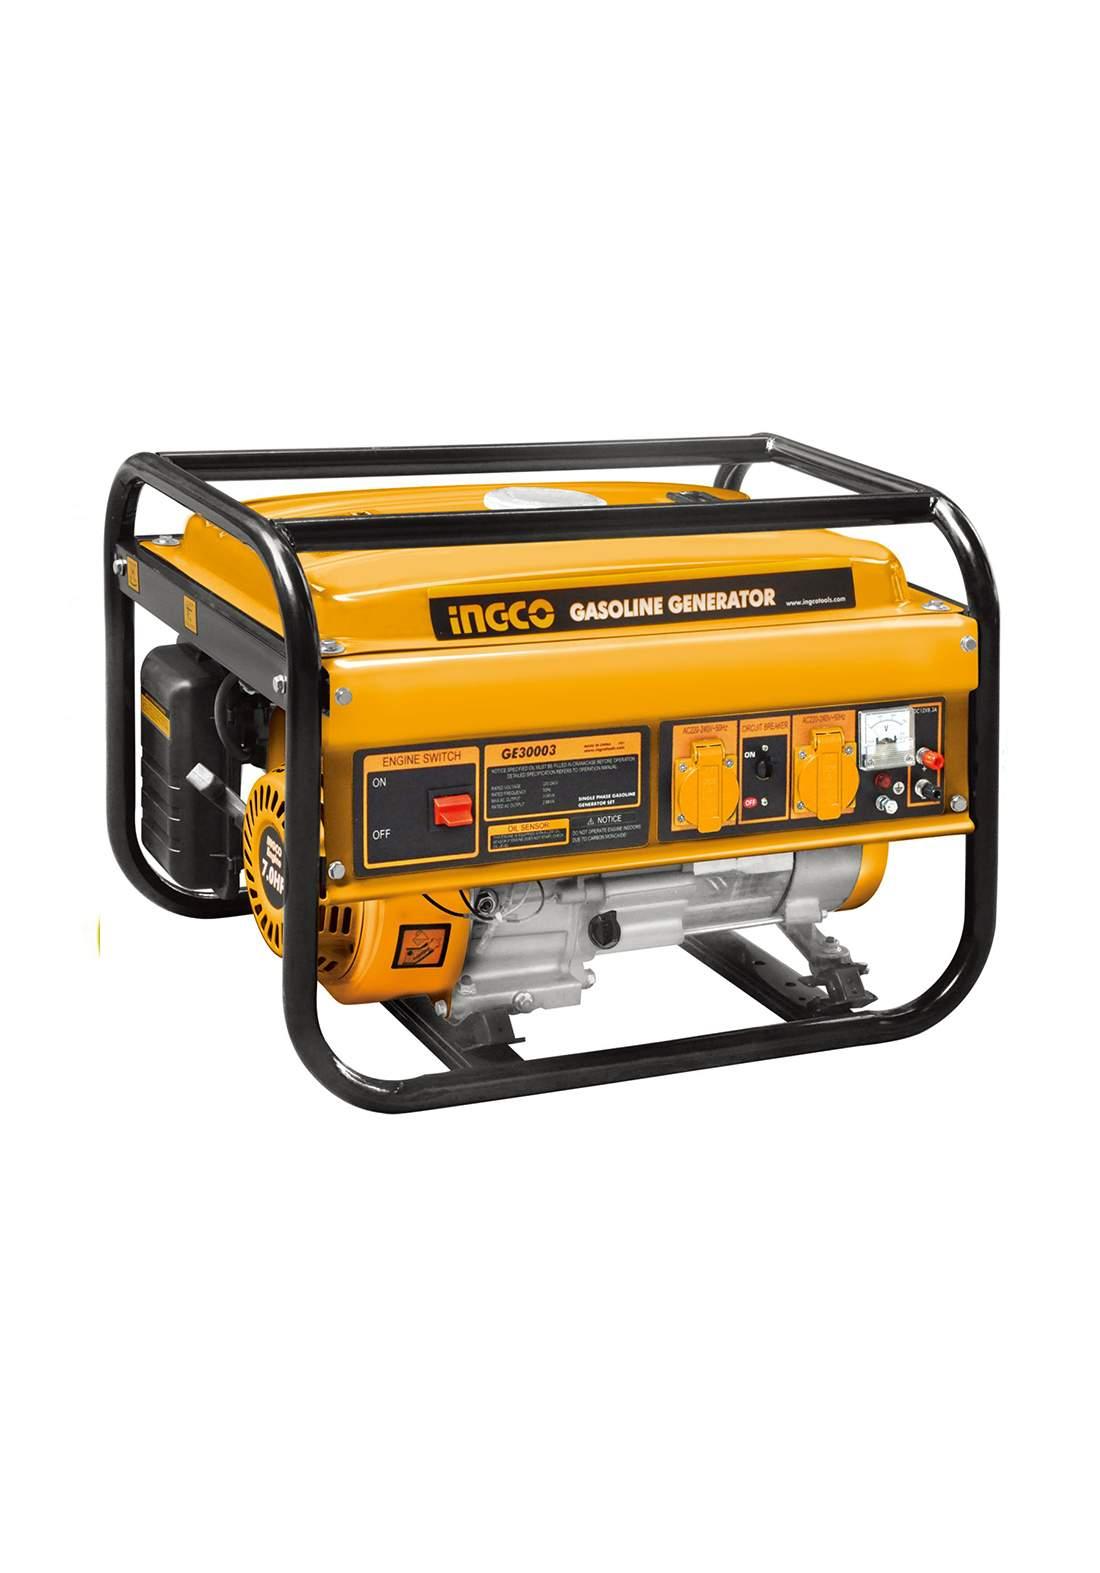 Ingco GE30003-1 Gasoline Generator 12 A 2800 W مولدة كهرباء سلف بانزين